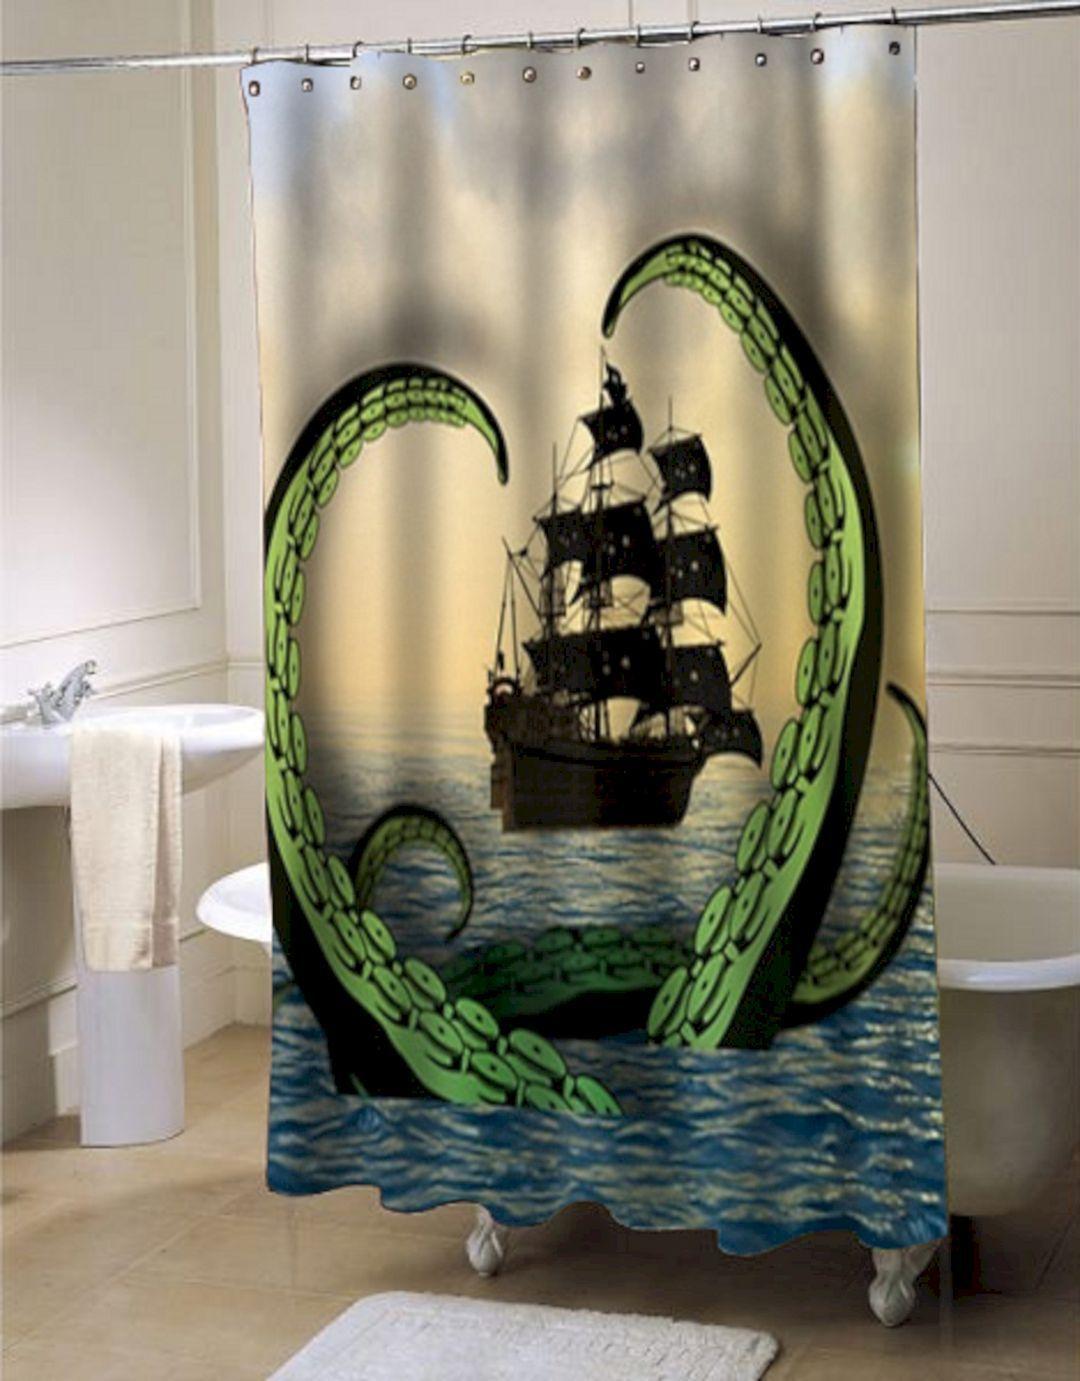 Pirate Ship Shower Curtain Bathroom Design Decor Mermaid Bathroom Decor Pirate Bathroom Pirate ship bathroom decor